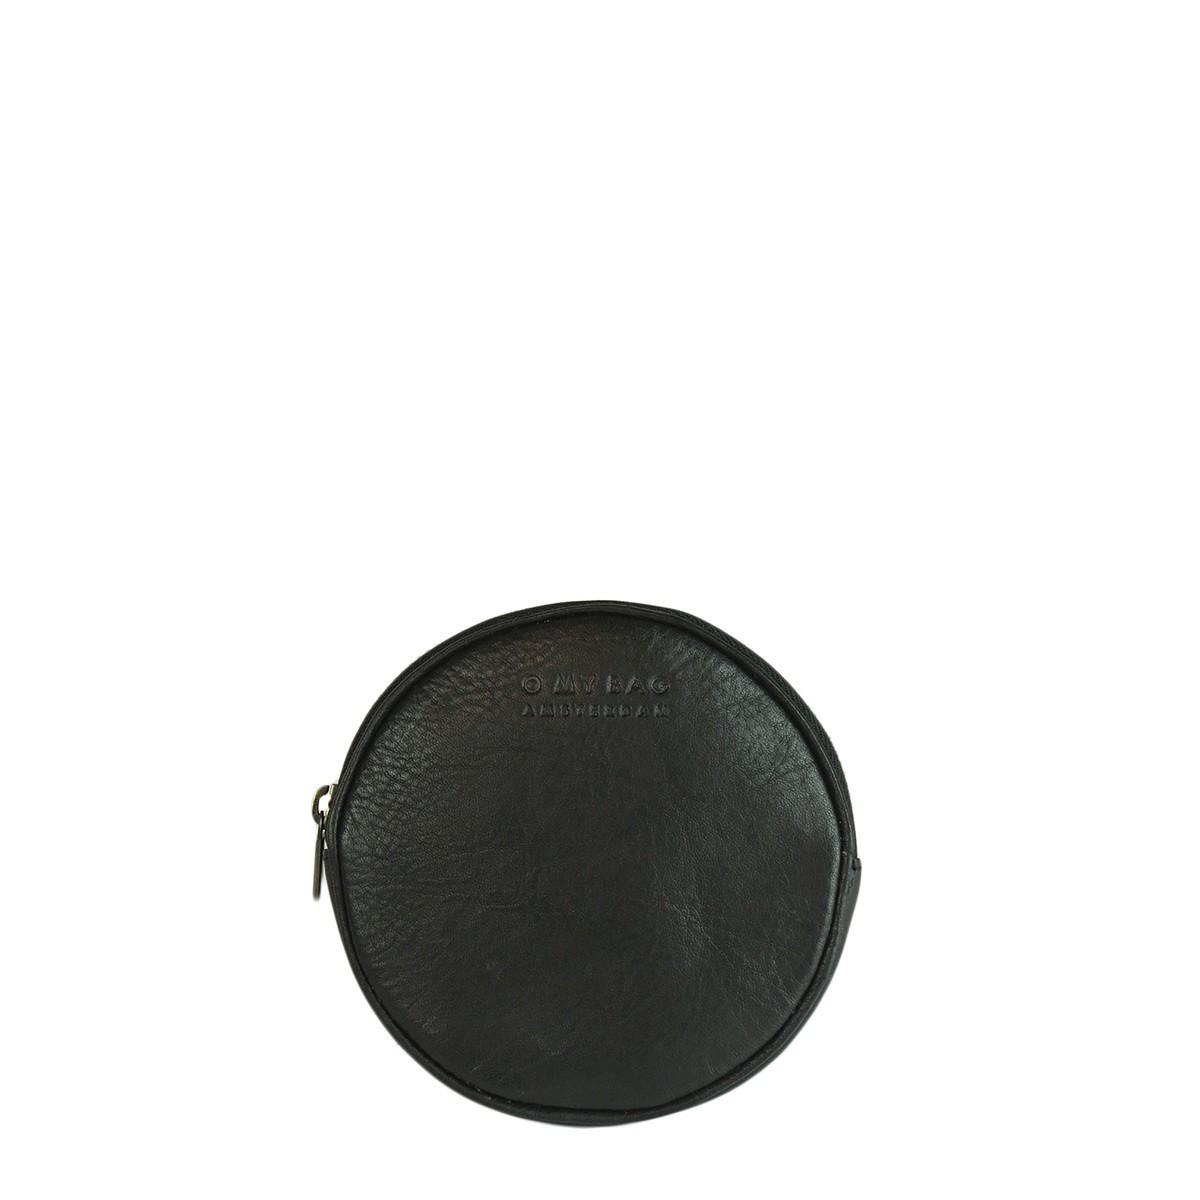 LUNA PURSE Eco-Midnight Black